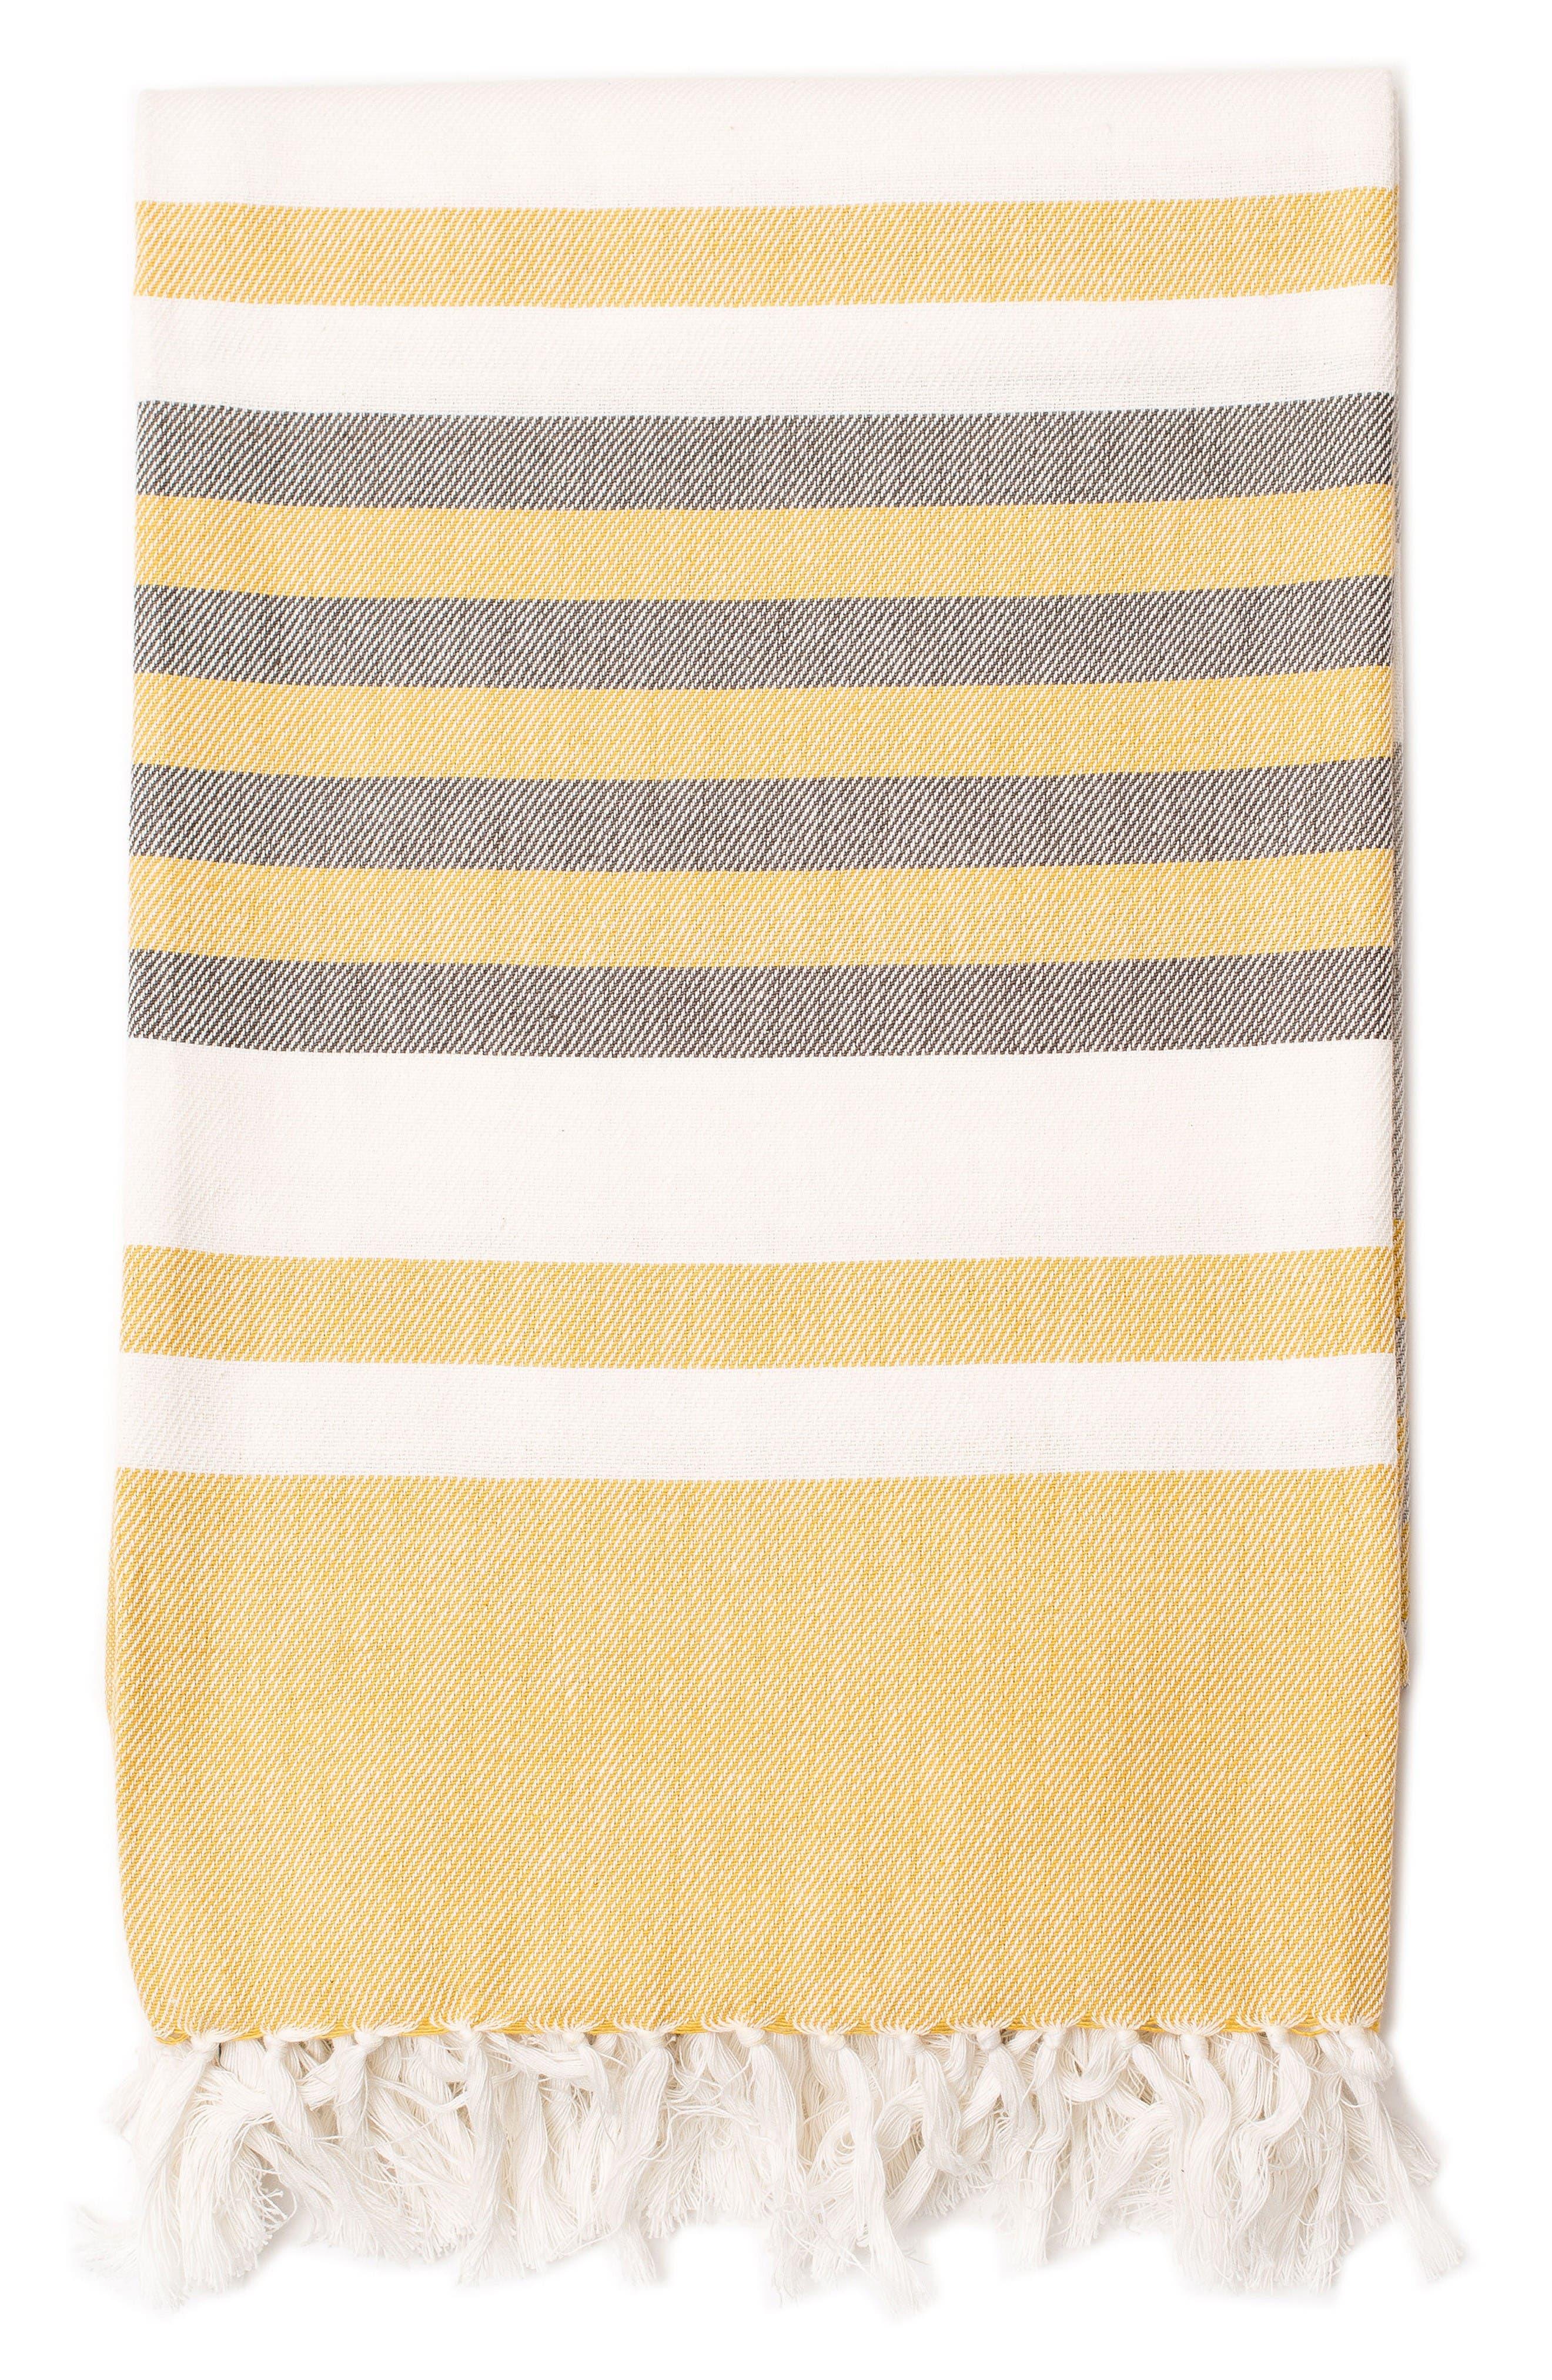 Alternate Image 1 Selected - zestt Riley Stripe Throw Blanket